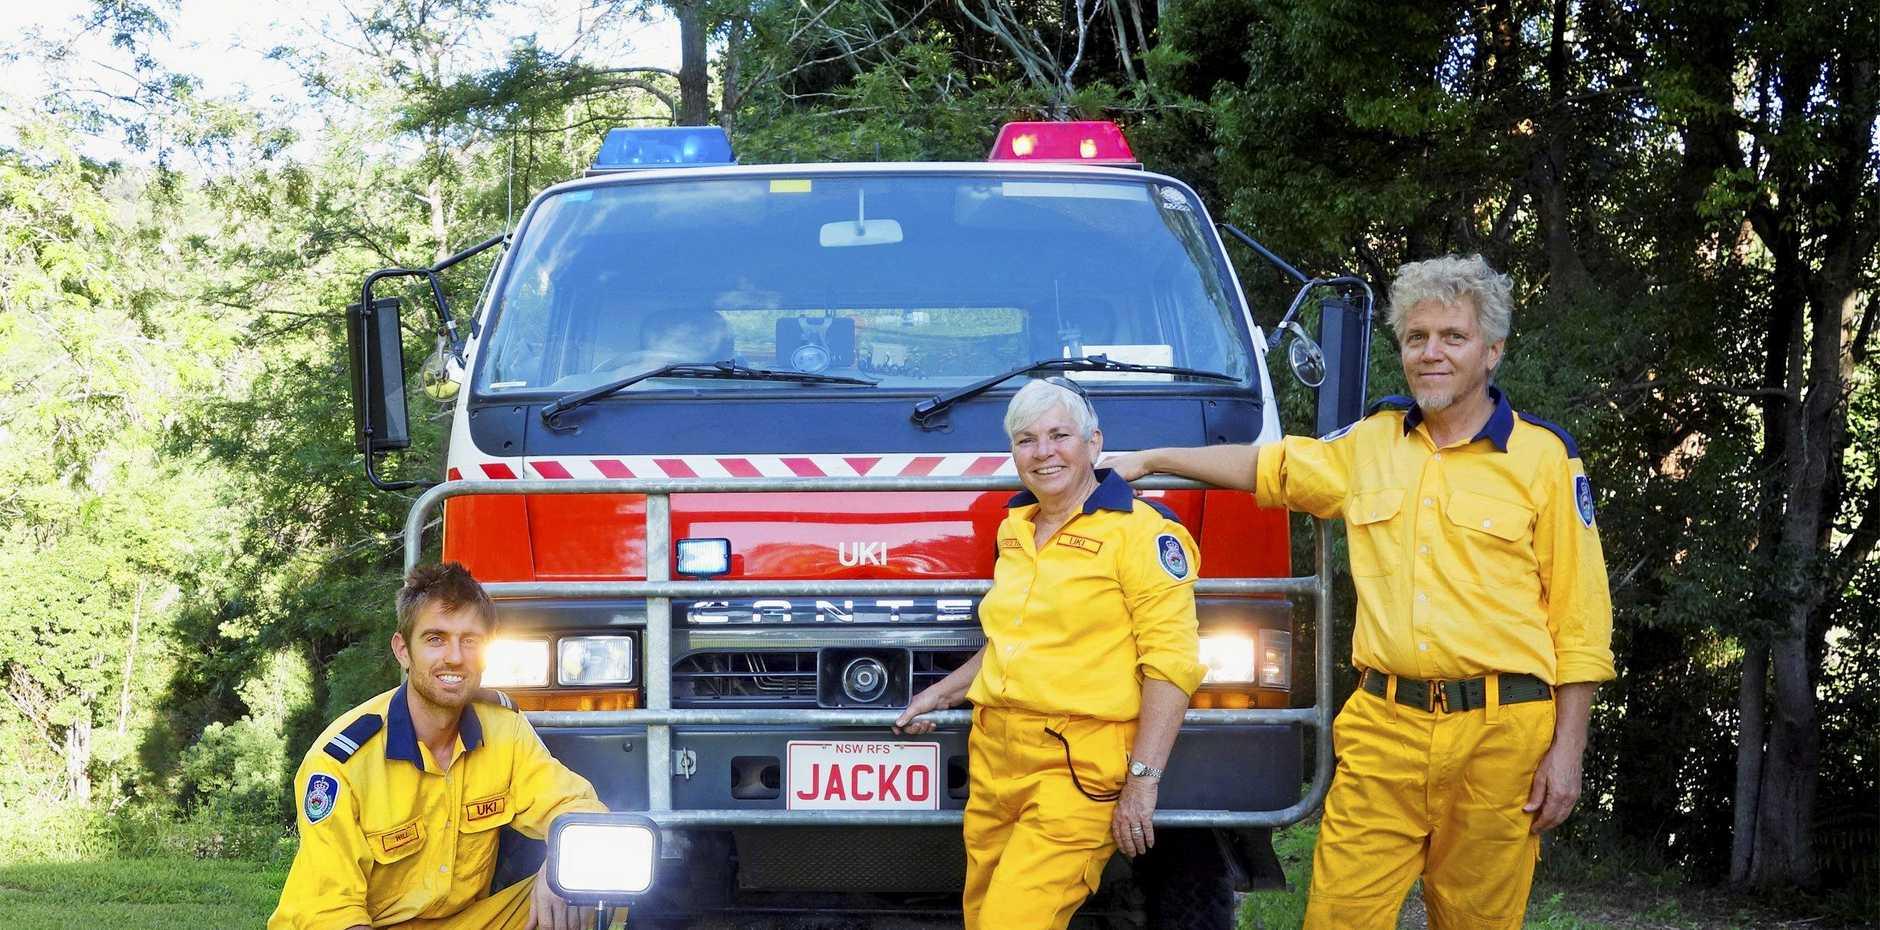 Uki Rural Fire Brigade volunteers Will Ambrose, Carolyn Jones and Bill Jacobi.